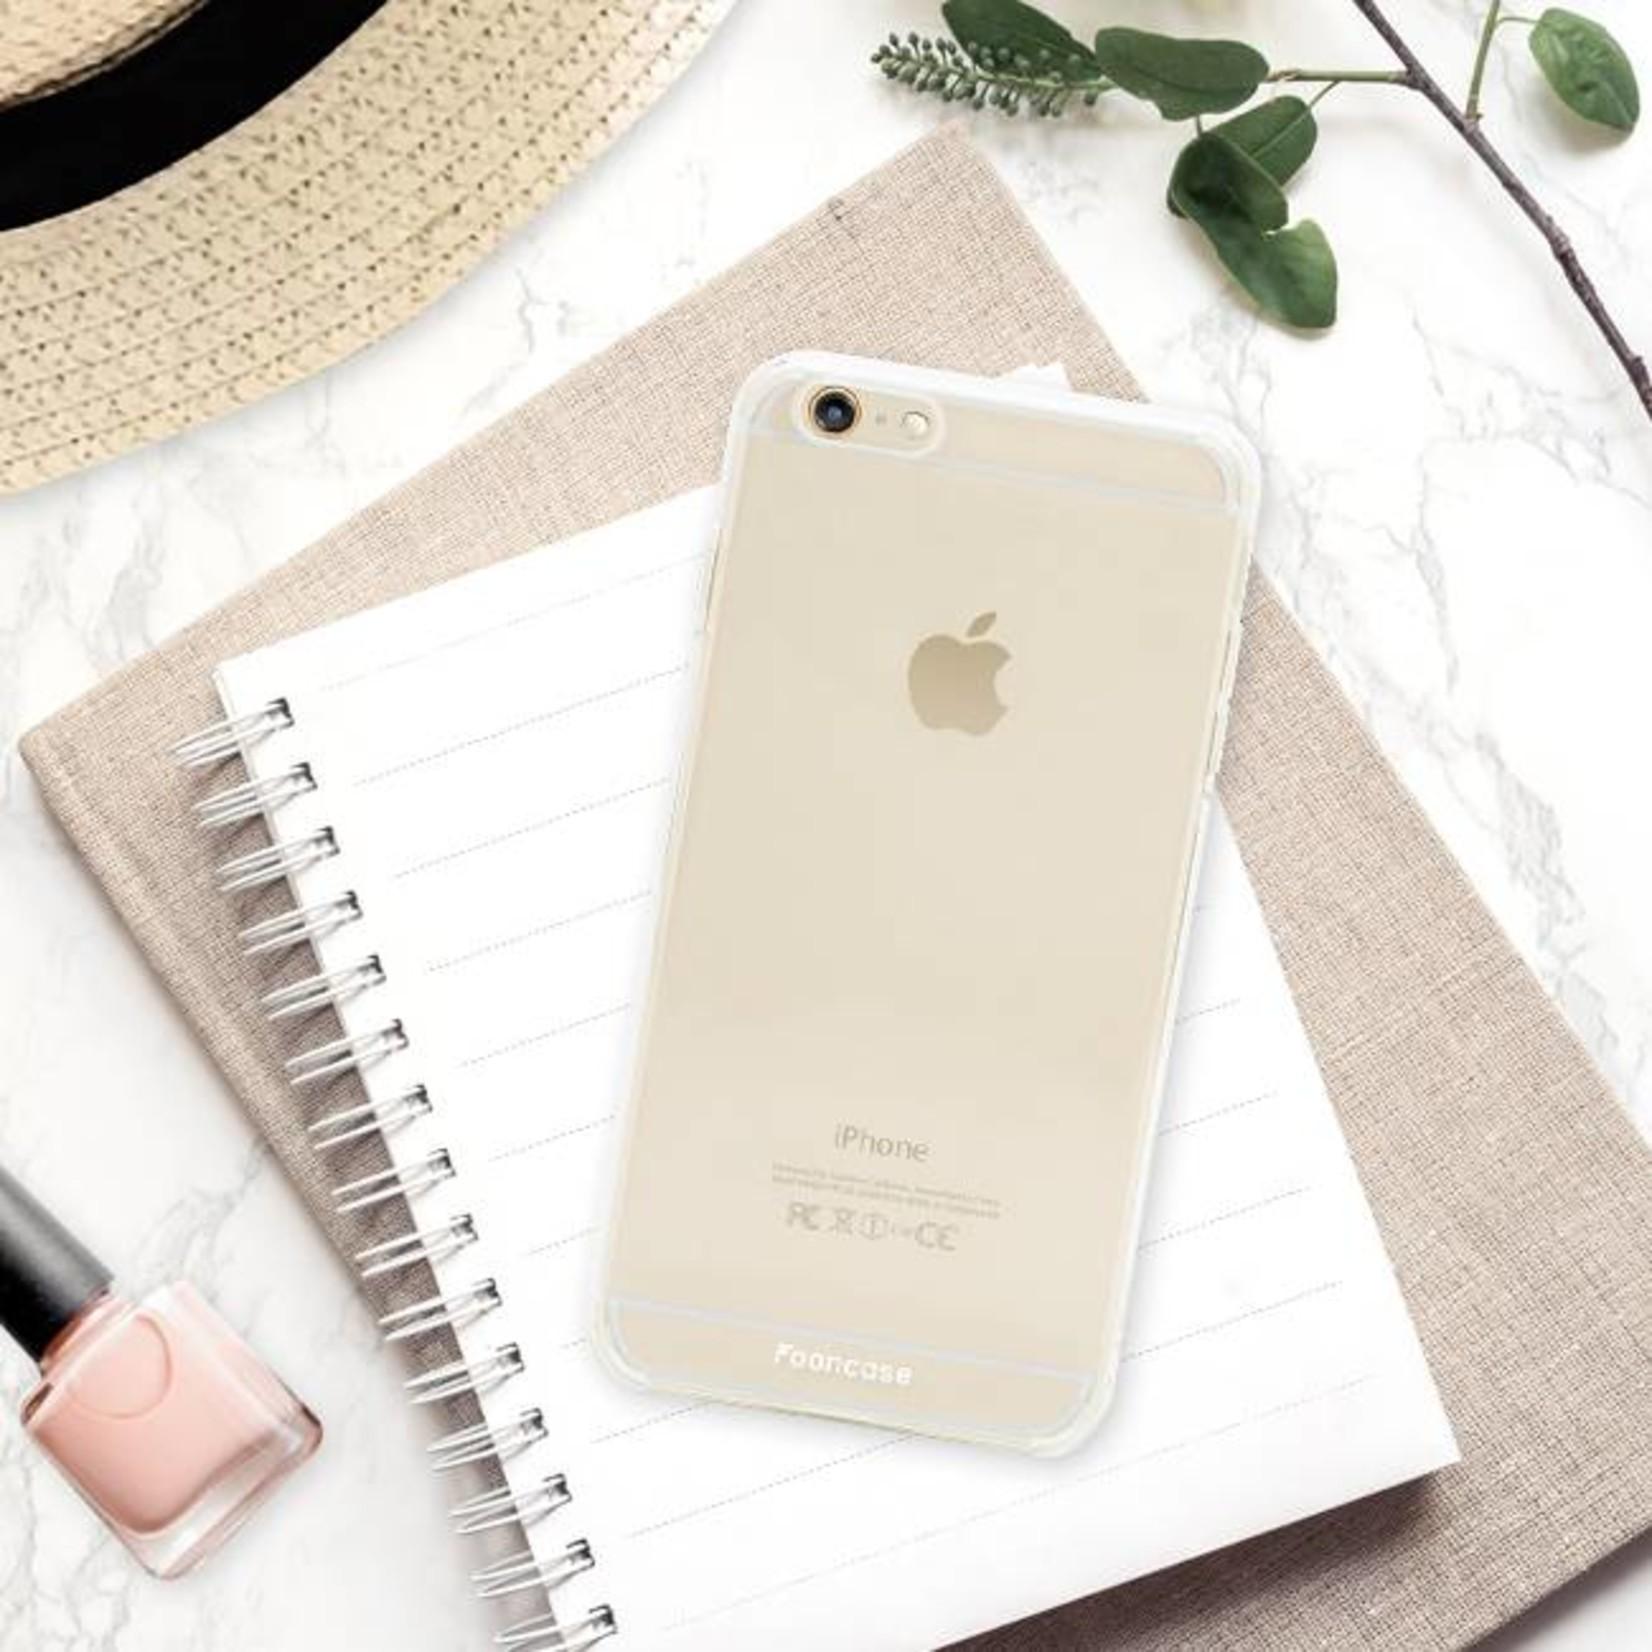 FOONCASE iPhone 6 / 6S hoesje TPU Soft Case - Back Cover - Transparant / Doorzichtig